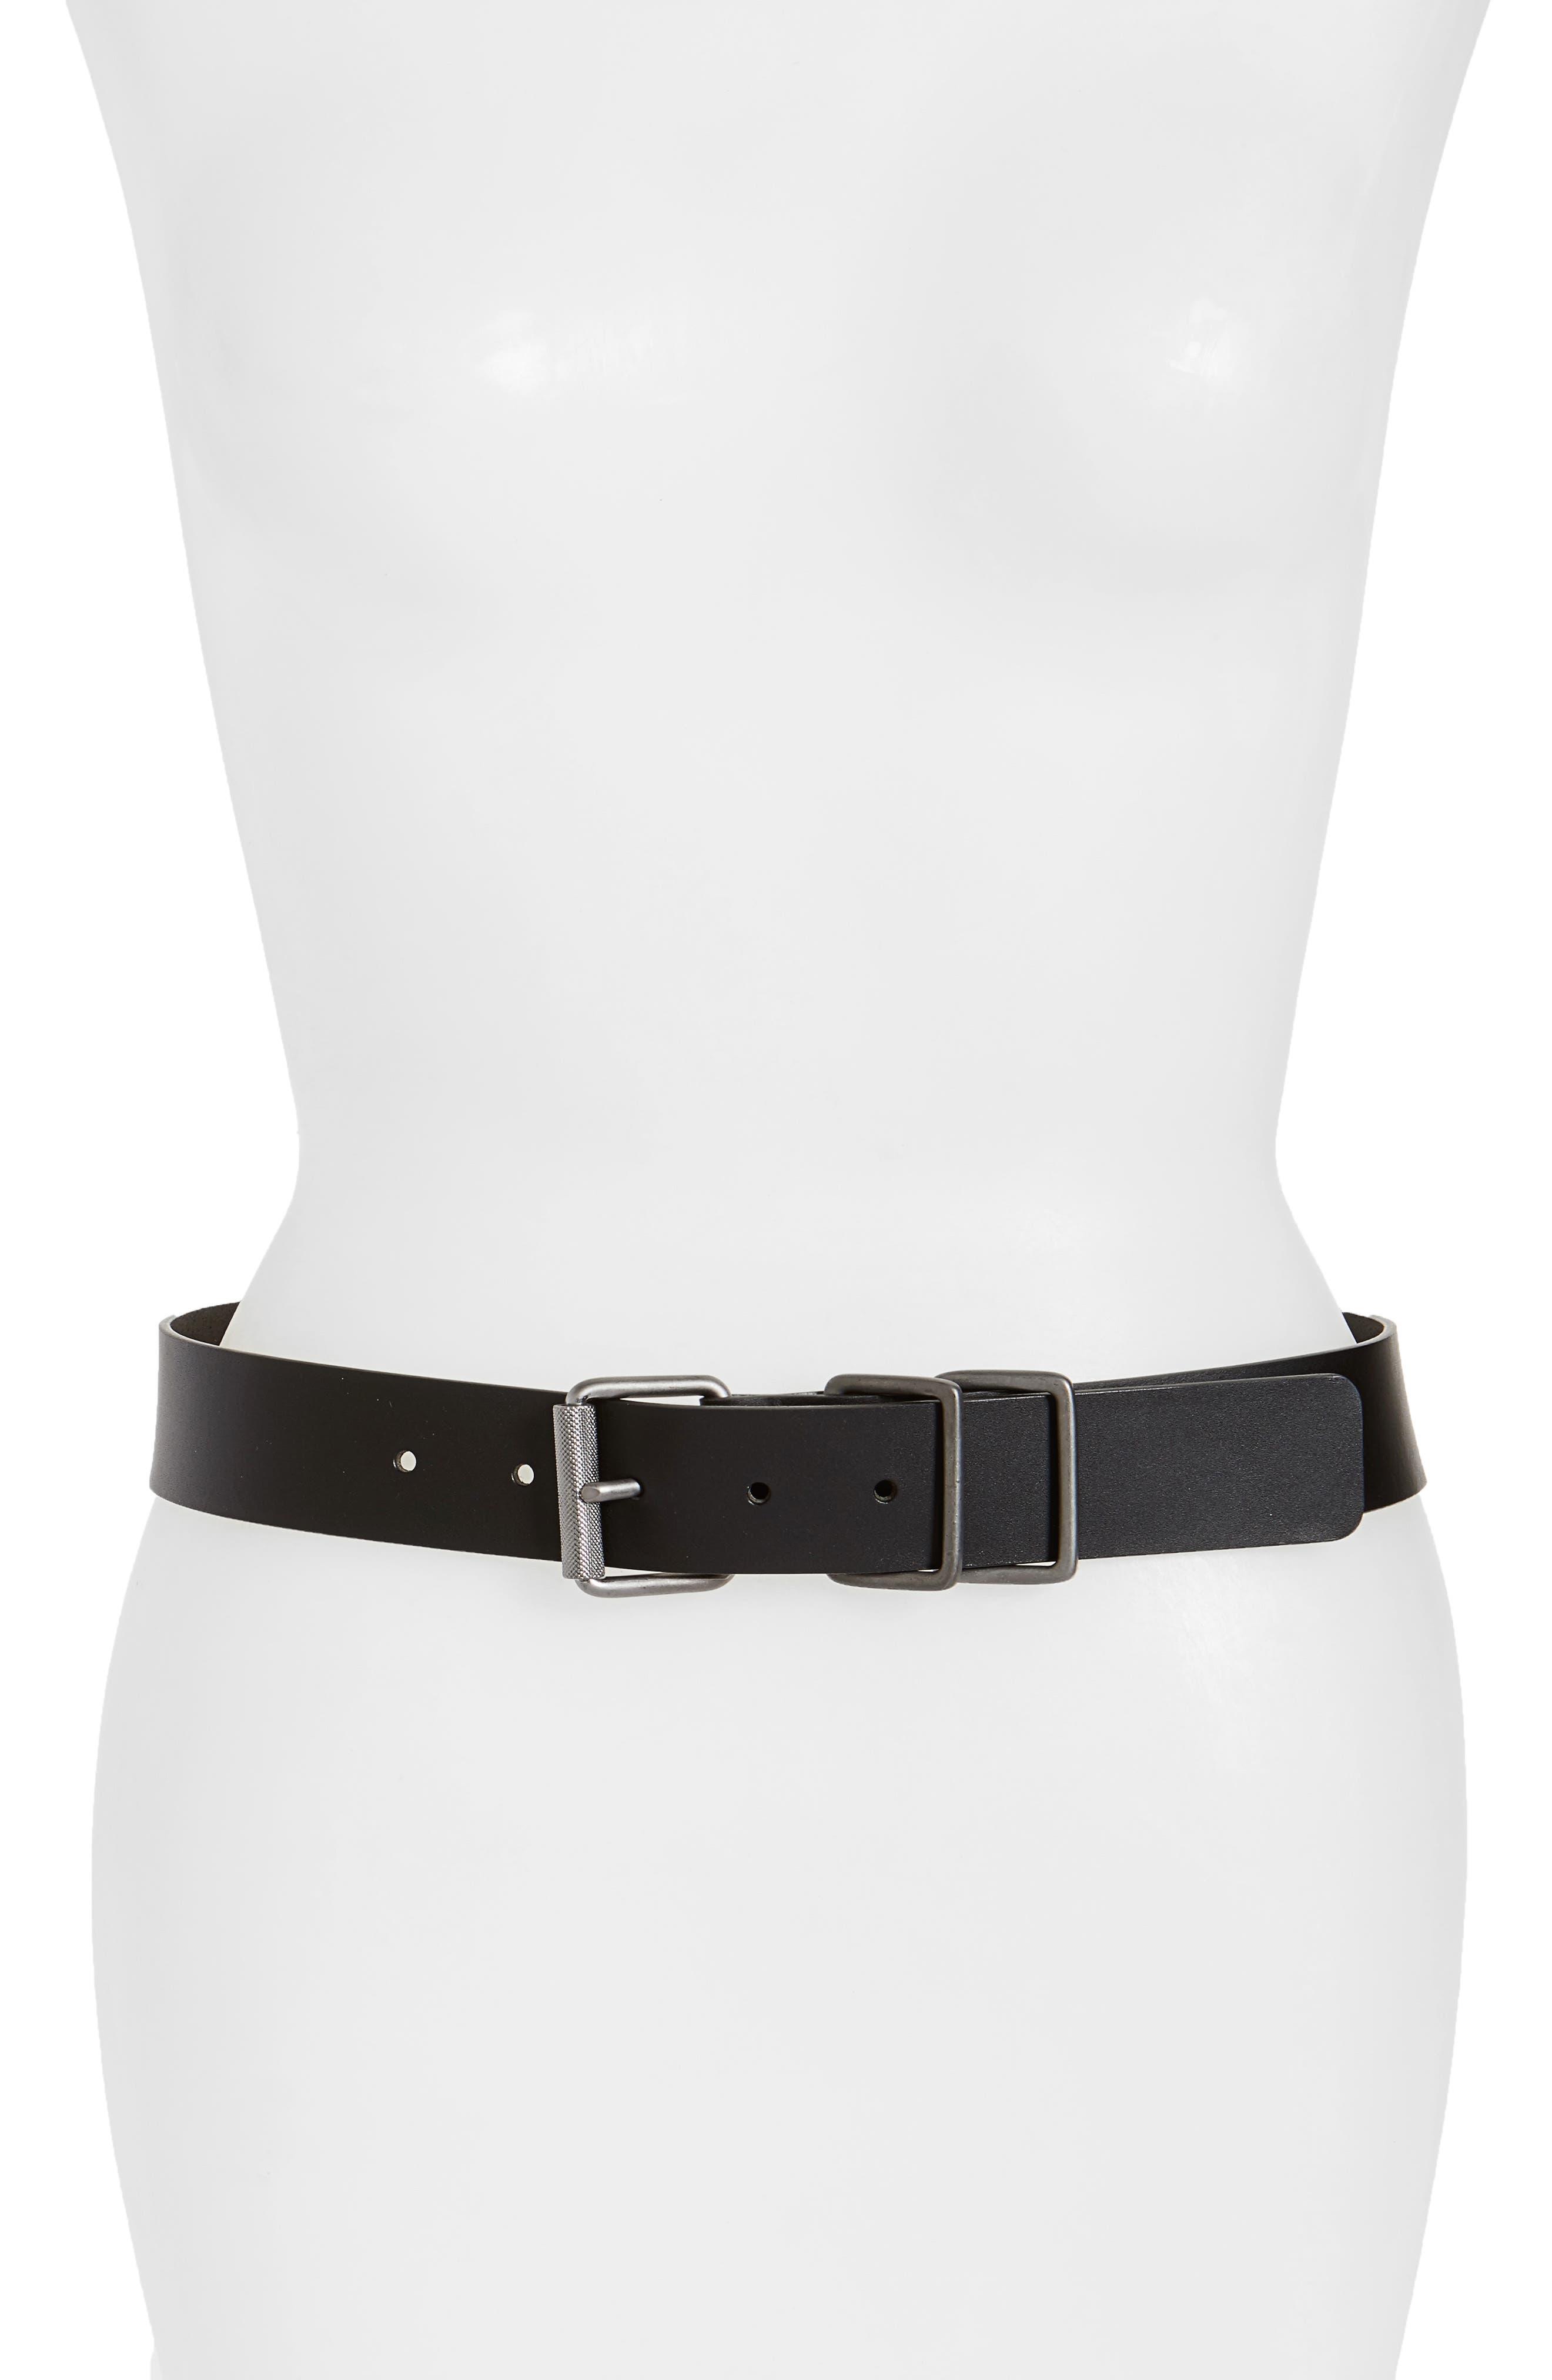 Frye Engineer Leather Belt (Nordstrom Exclusive)